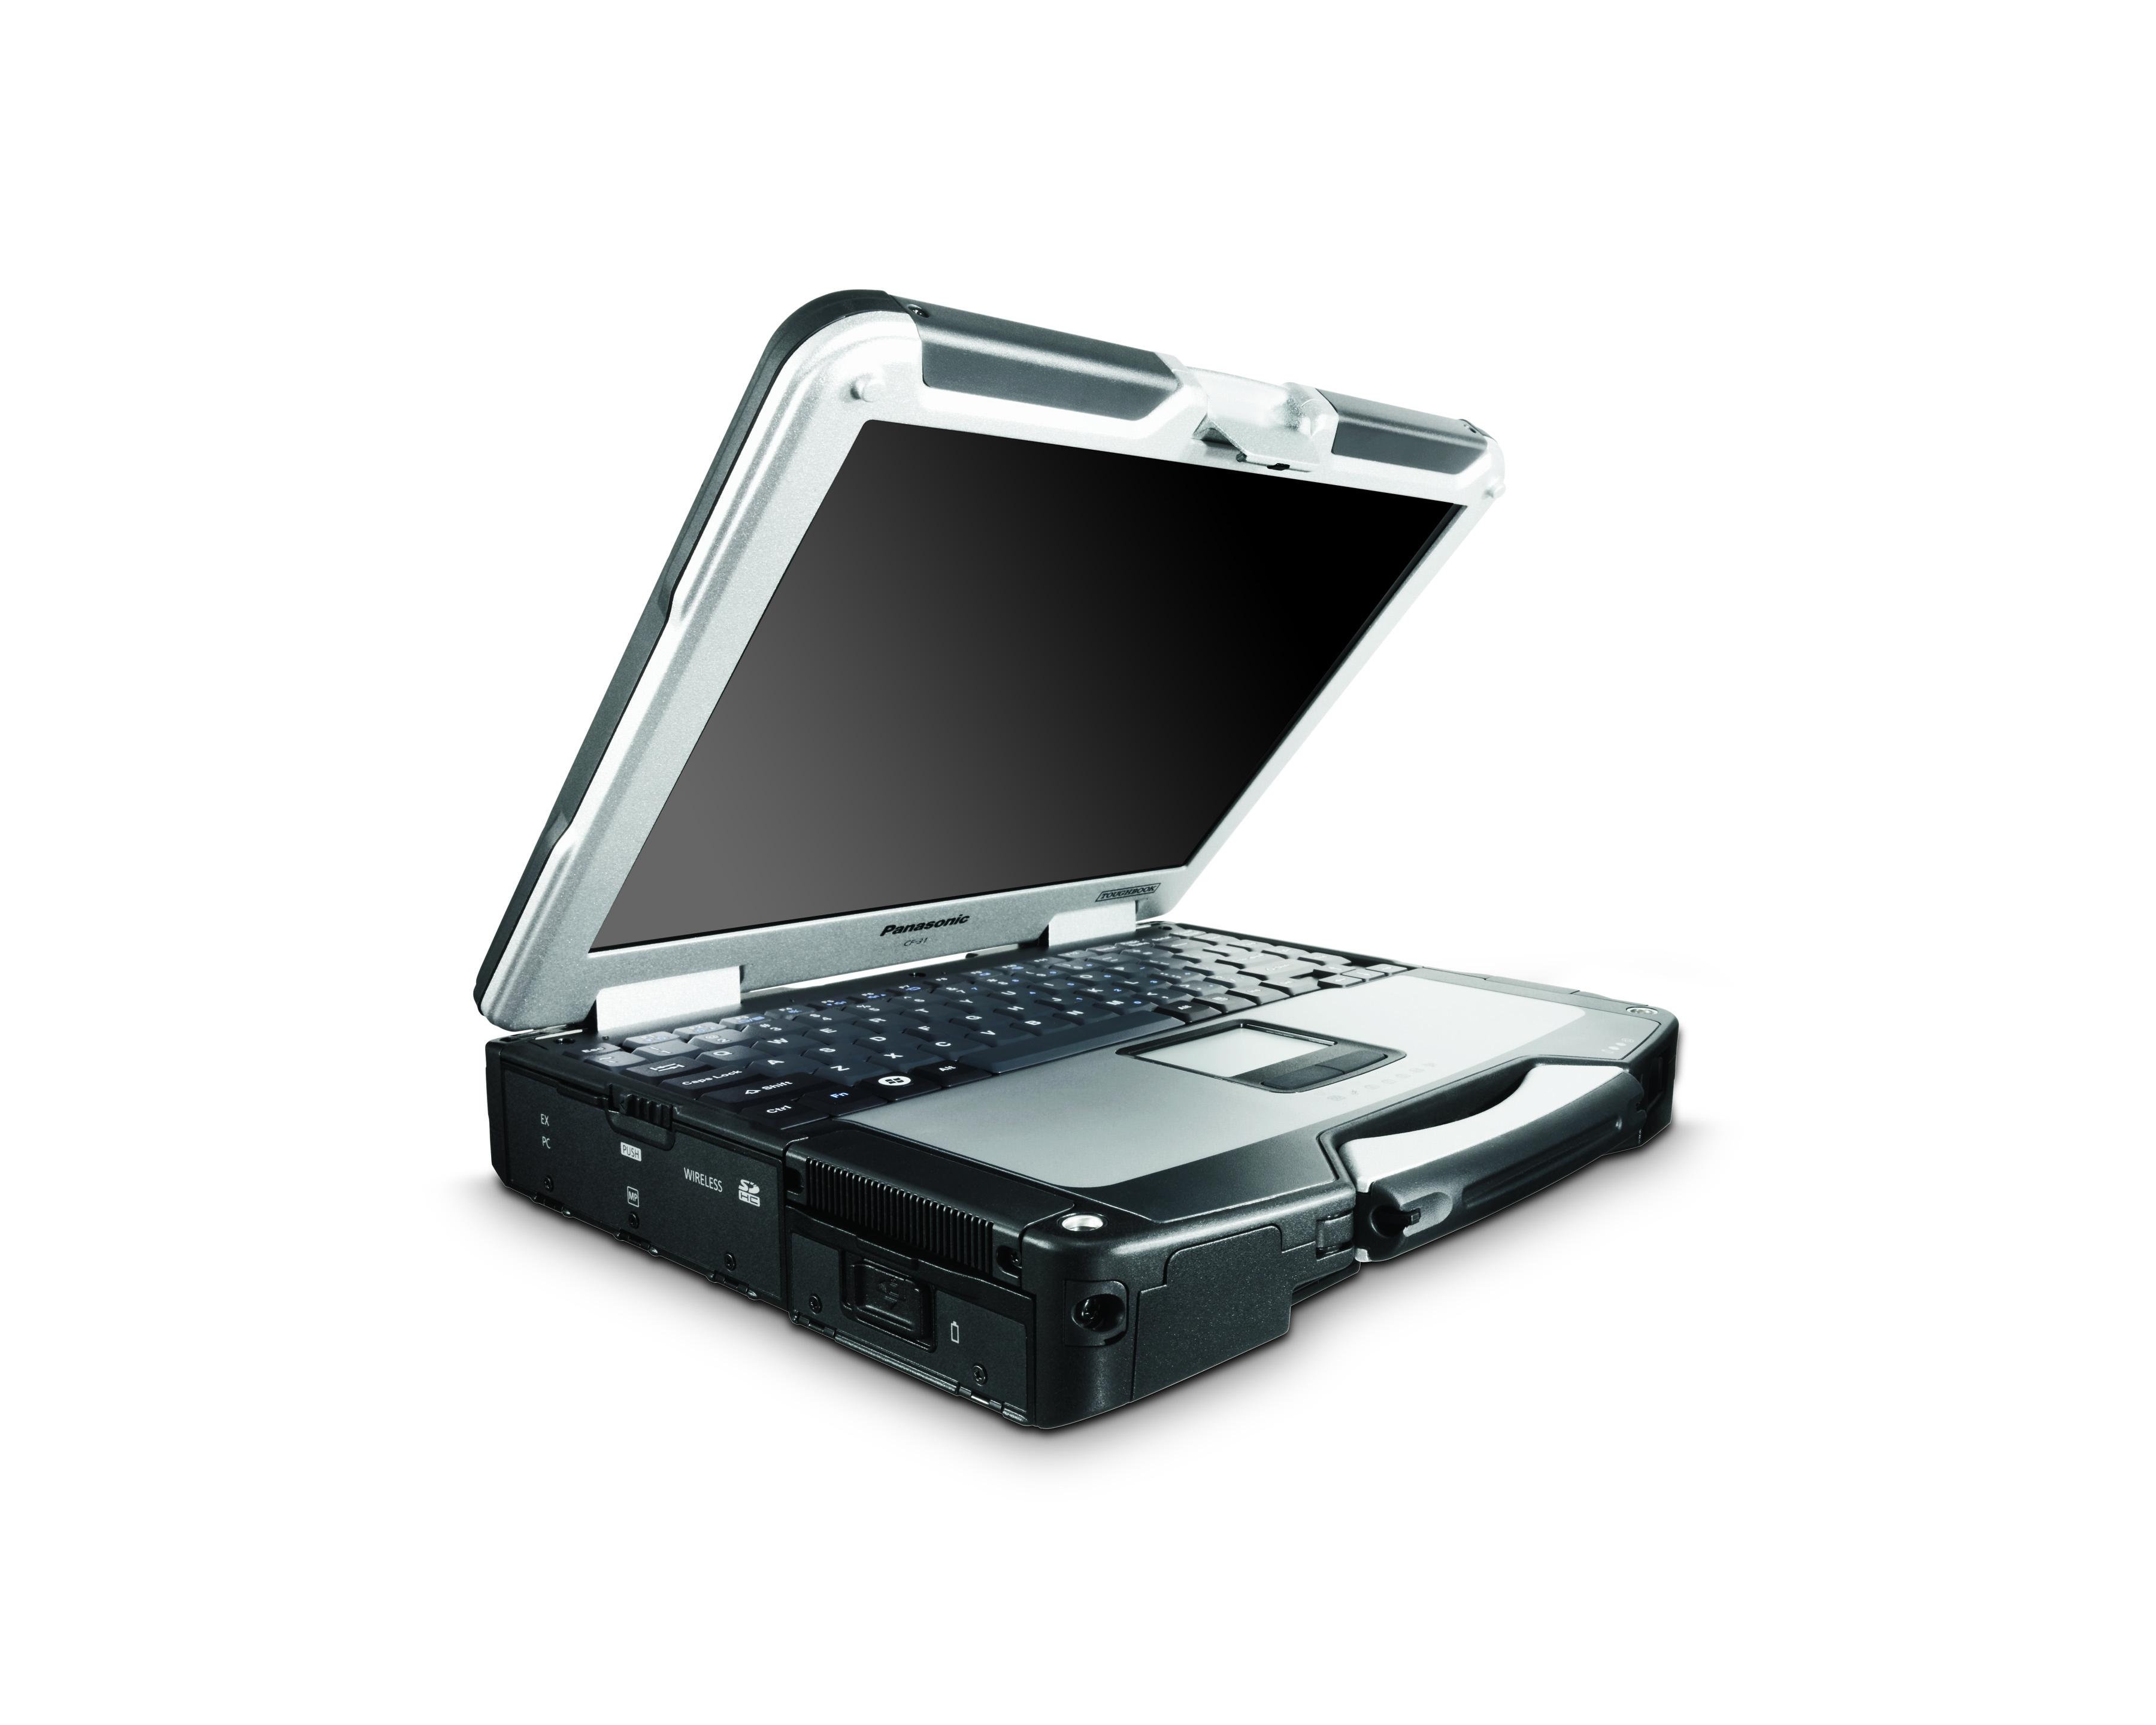 Notebook Panasonic Toughbook Computer Wallpapers Desktop Backgrounds 3600x2880